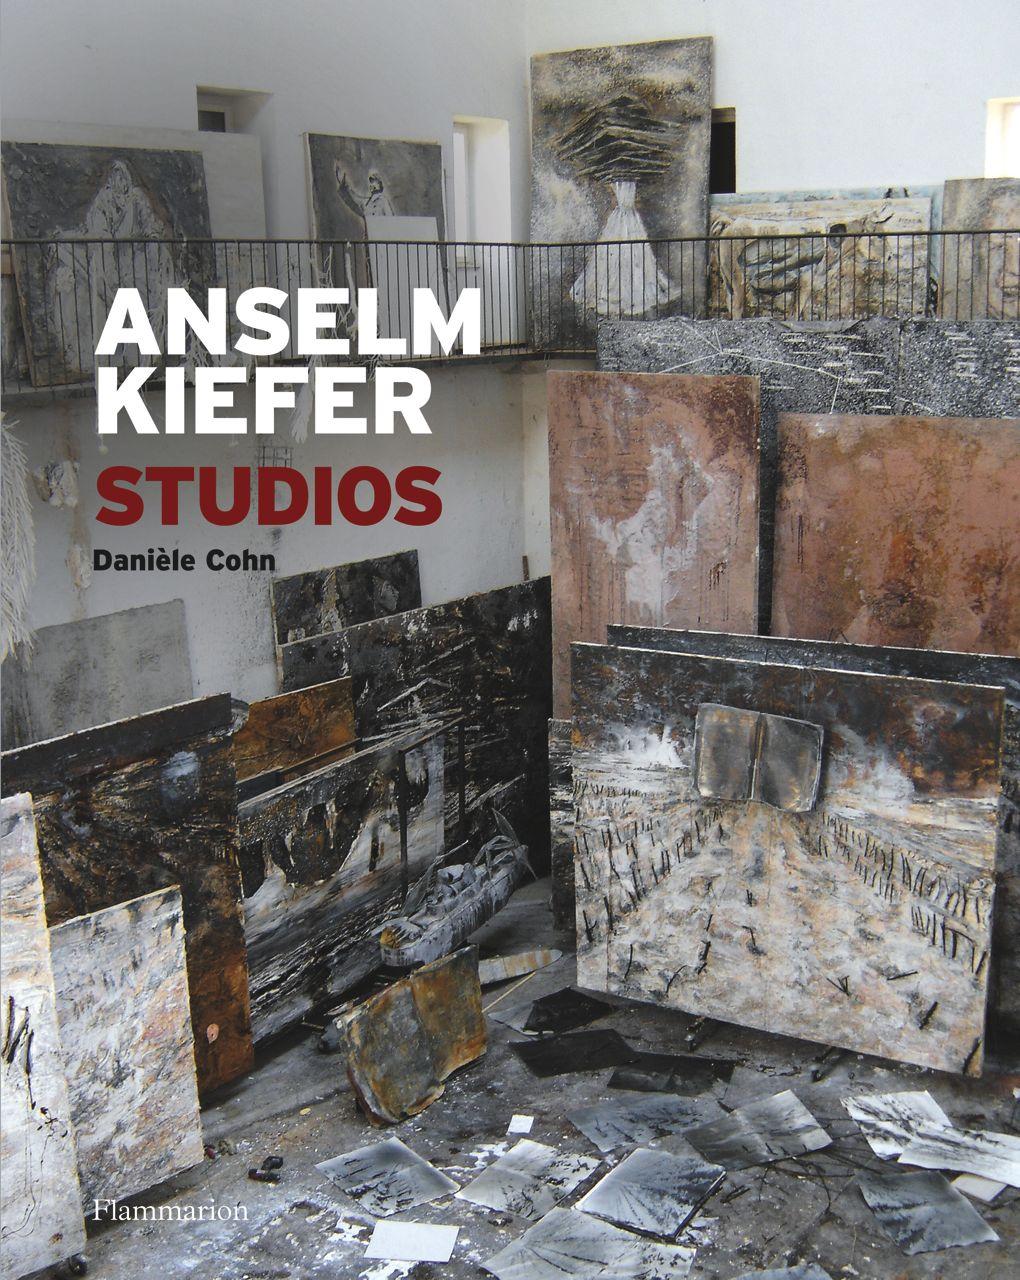 Anselm Kiefer: Studios - StyleZeitgeist